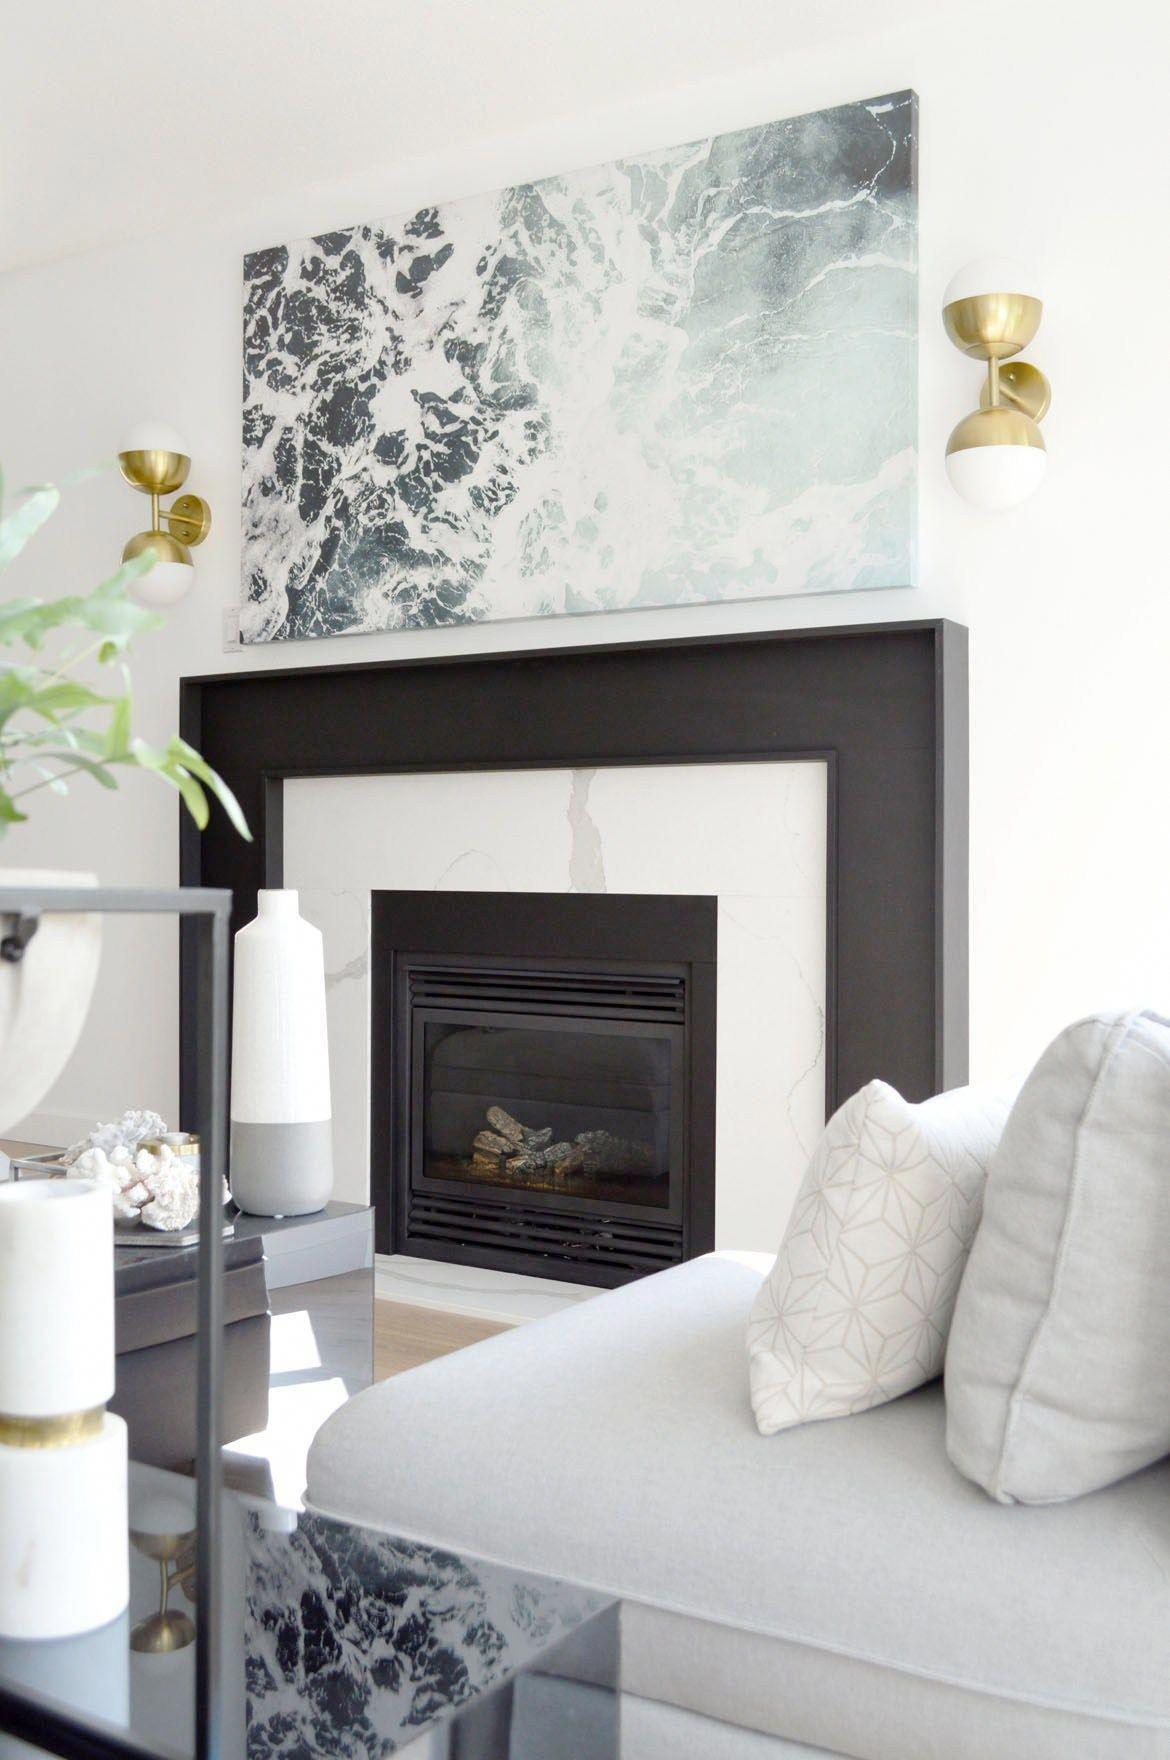 Diy fireplace makeover marble black fireplacedecorating